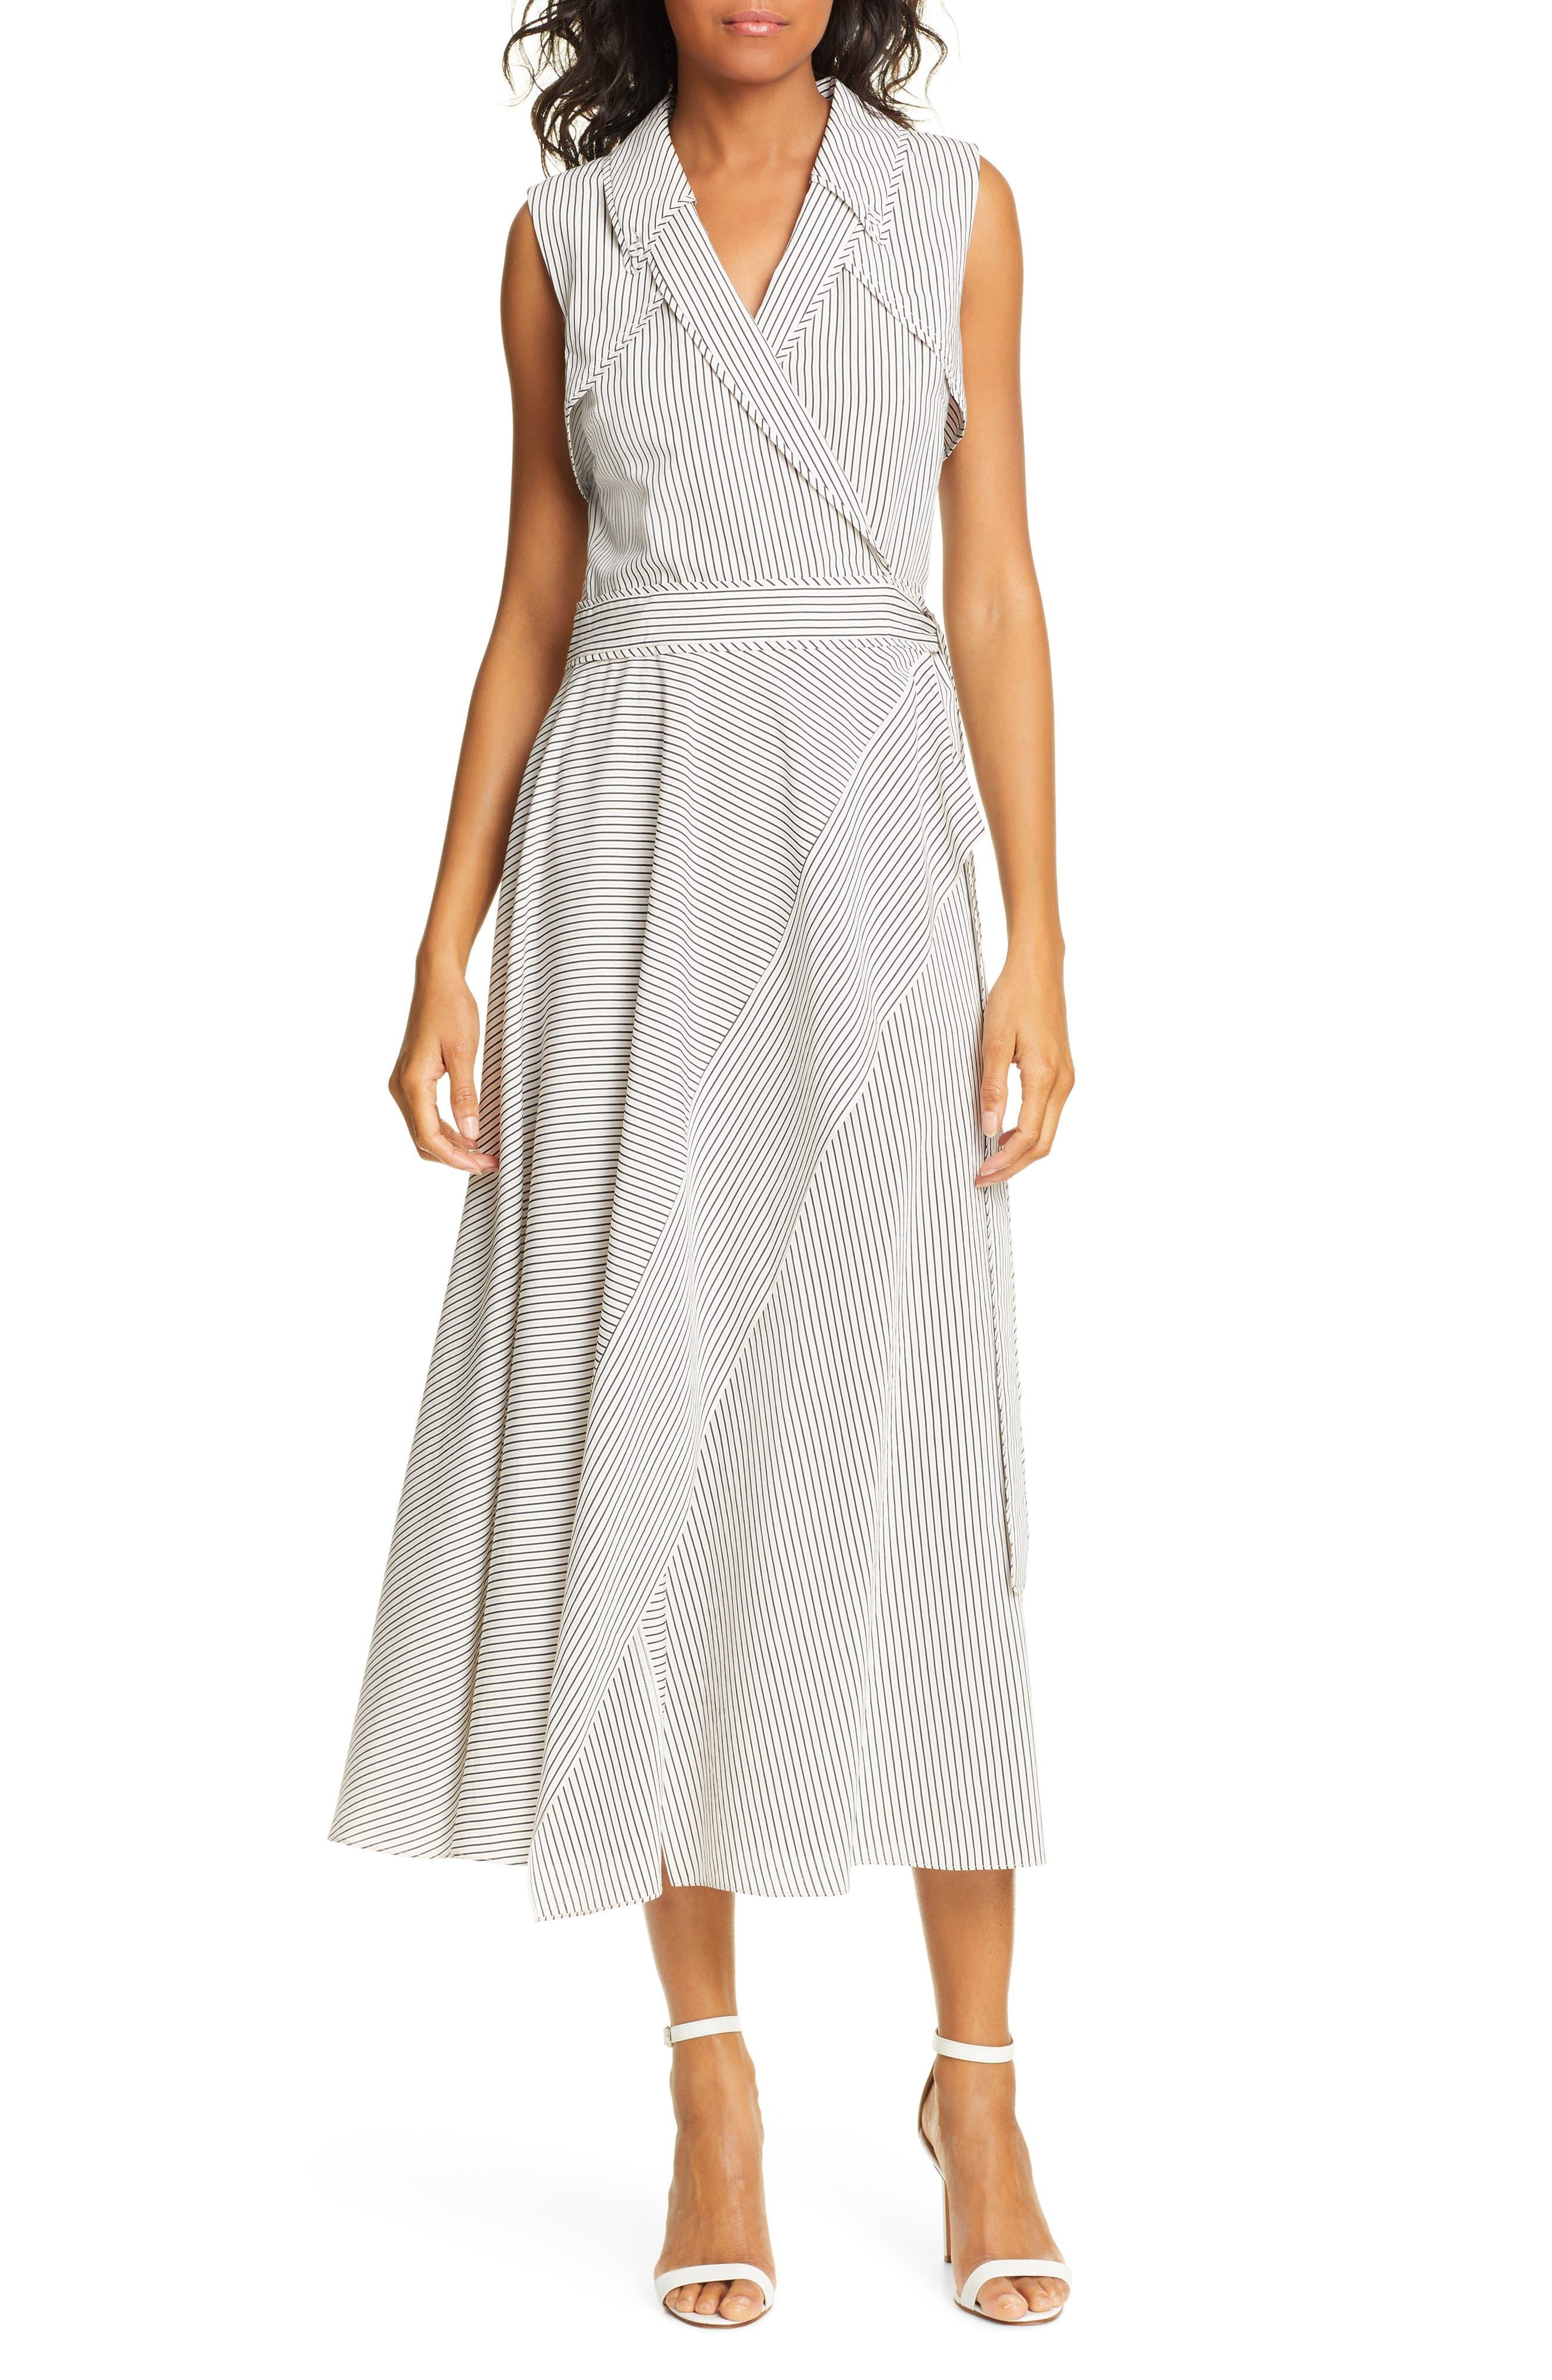 09409e612c237 diane von furstenberg dresses | Nordstrom